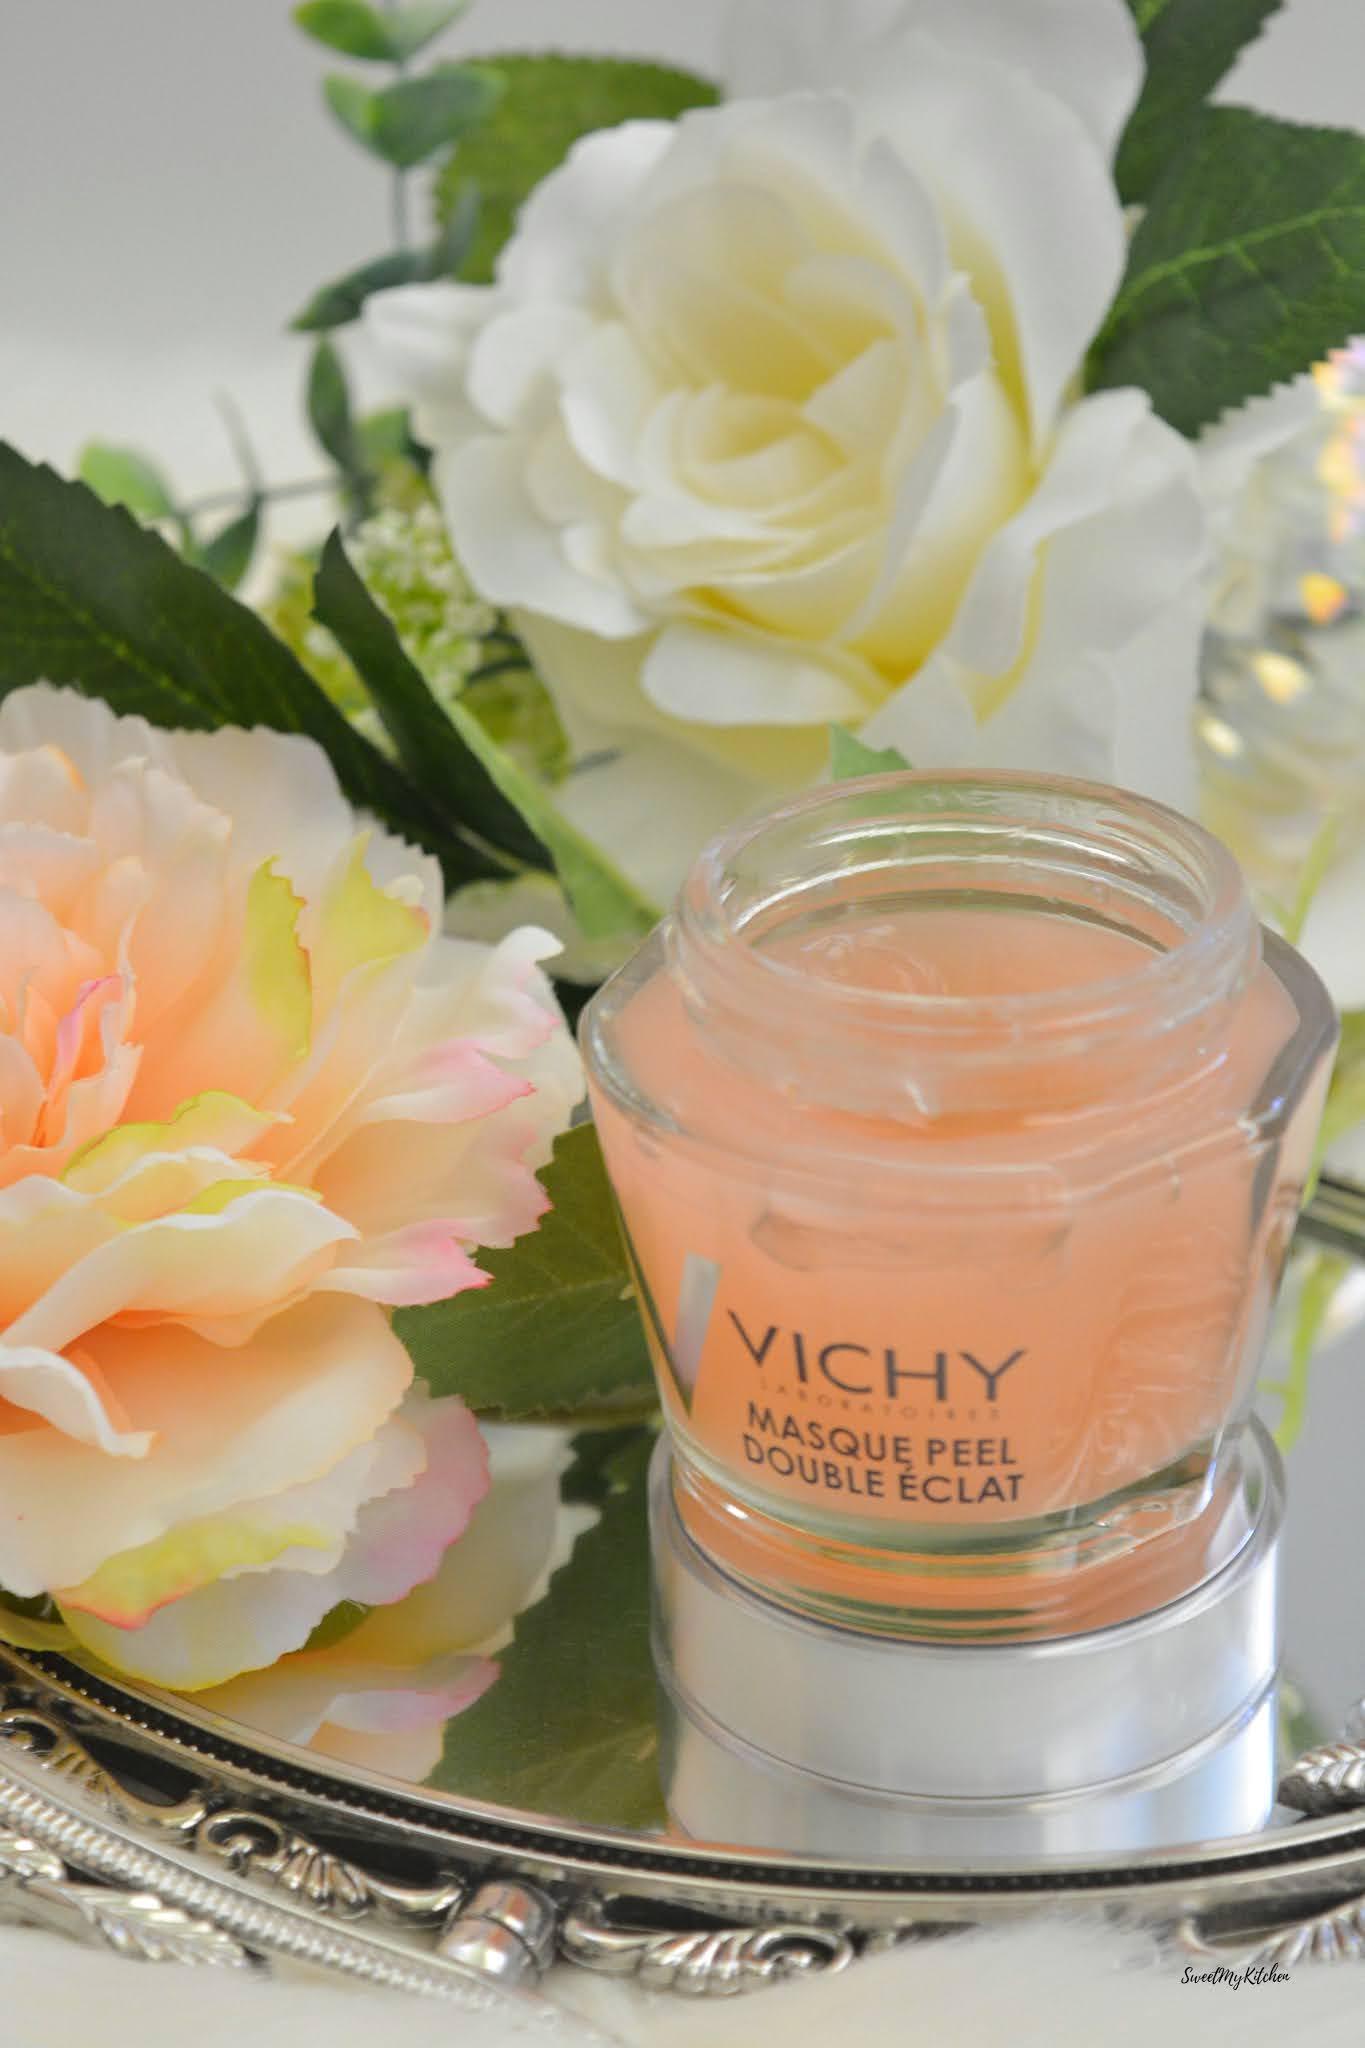 Vichy Masque Peel Double Éclat glow peel mask